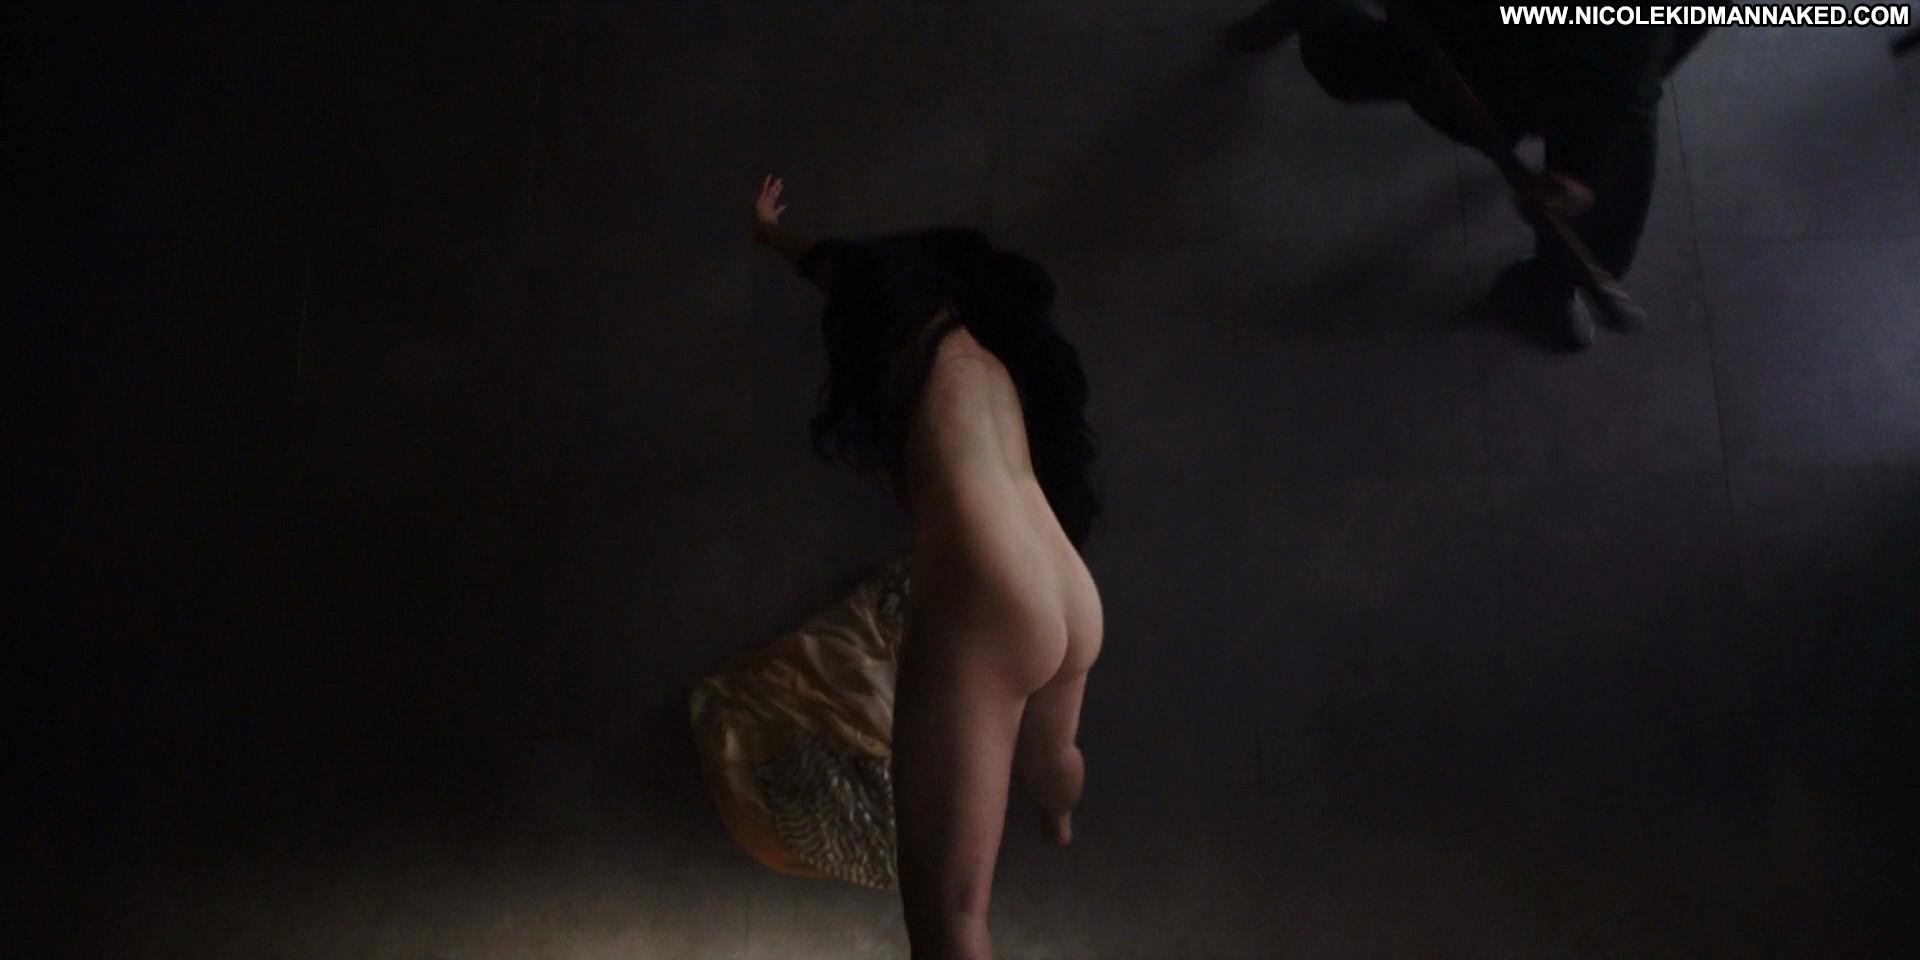 Julie chen full nudity — photo 7